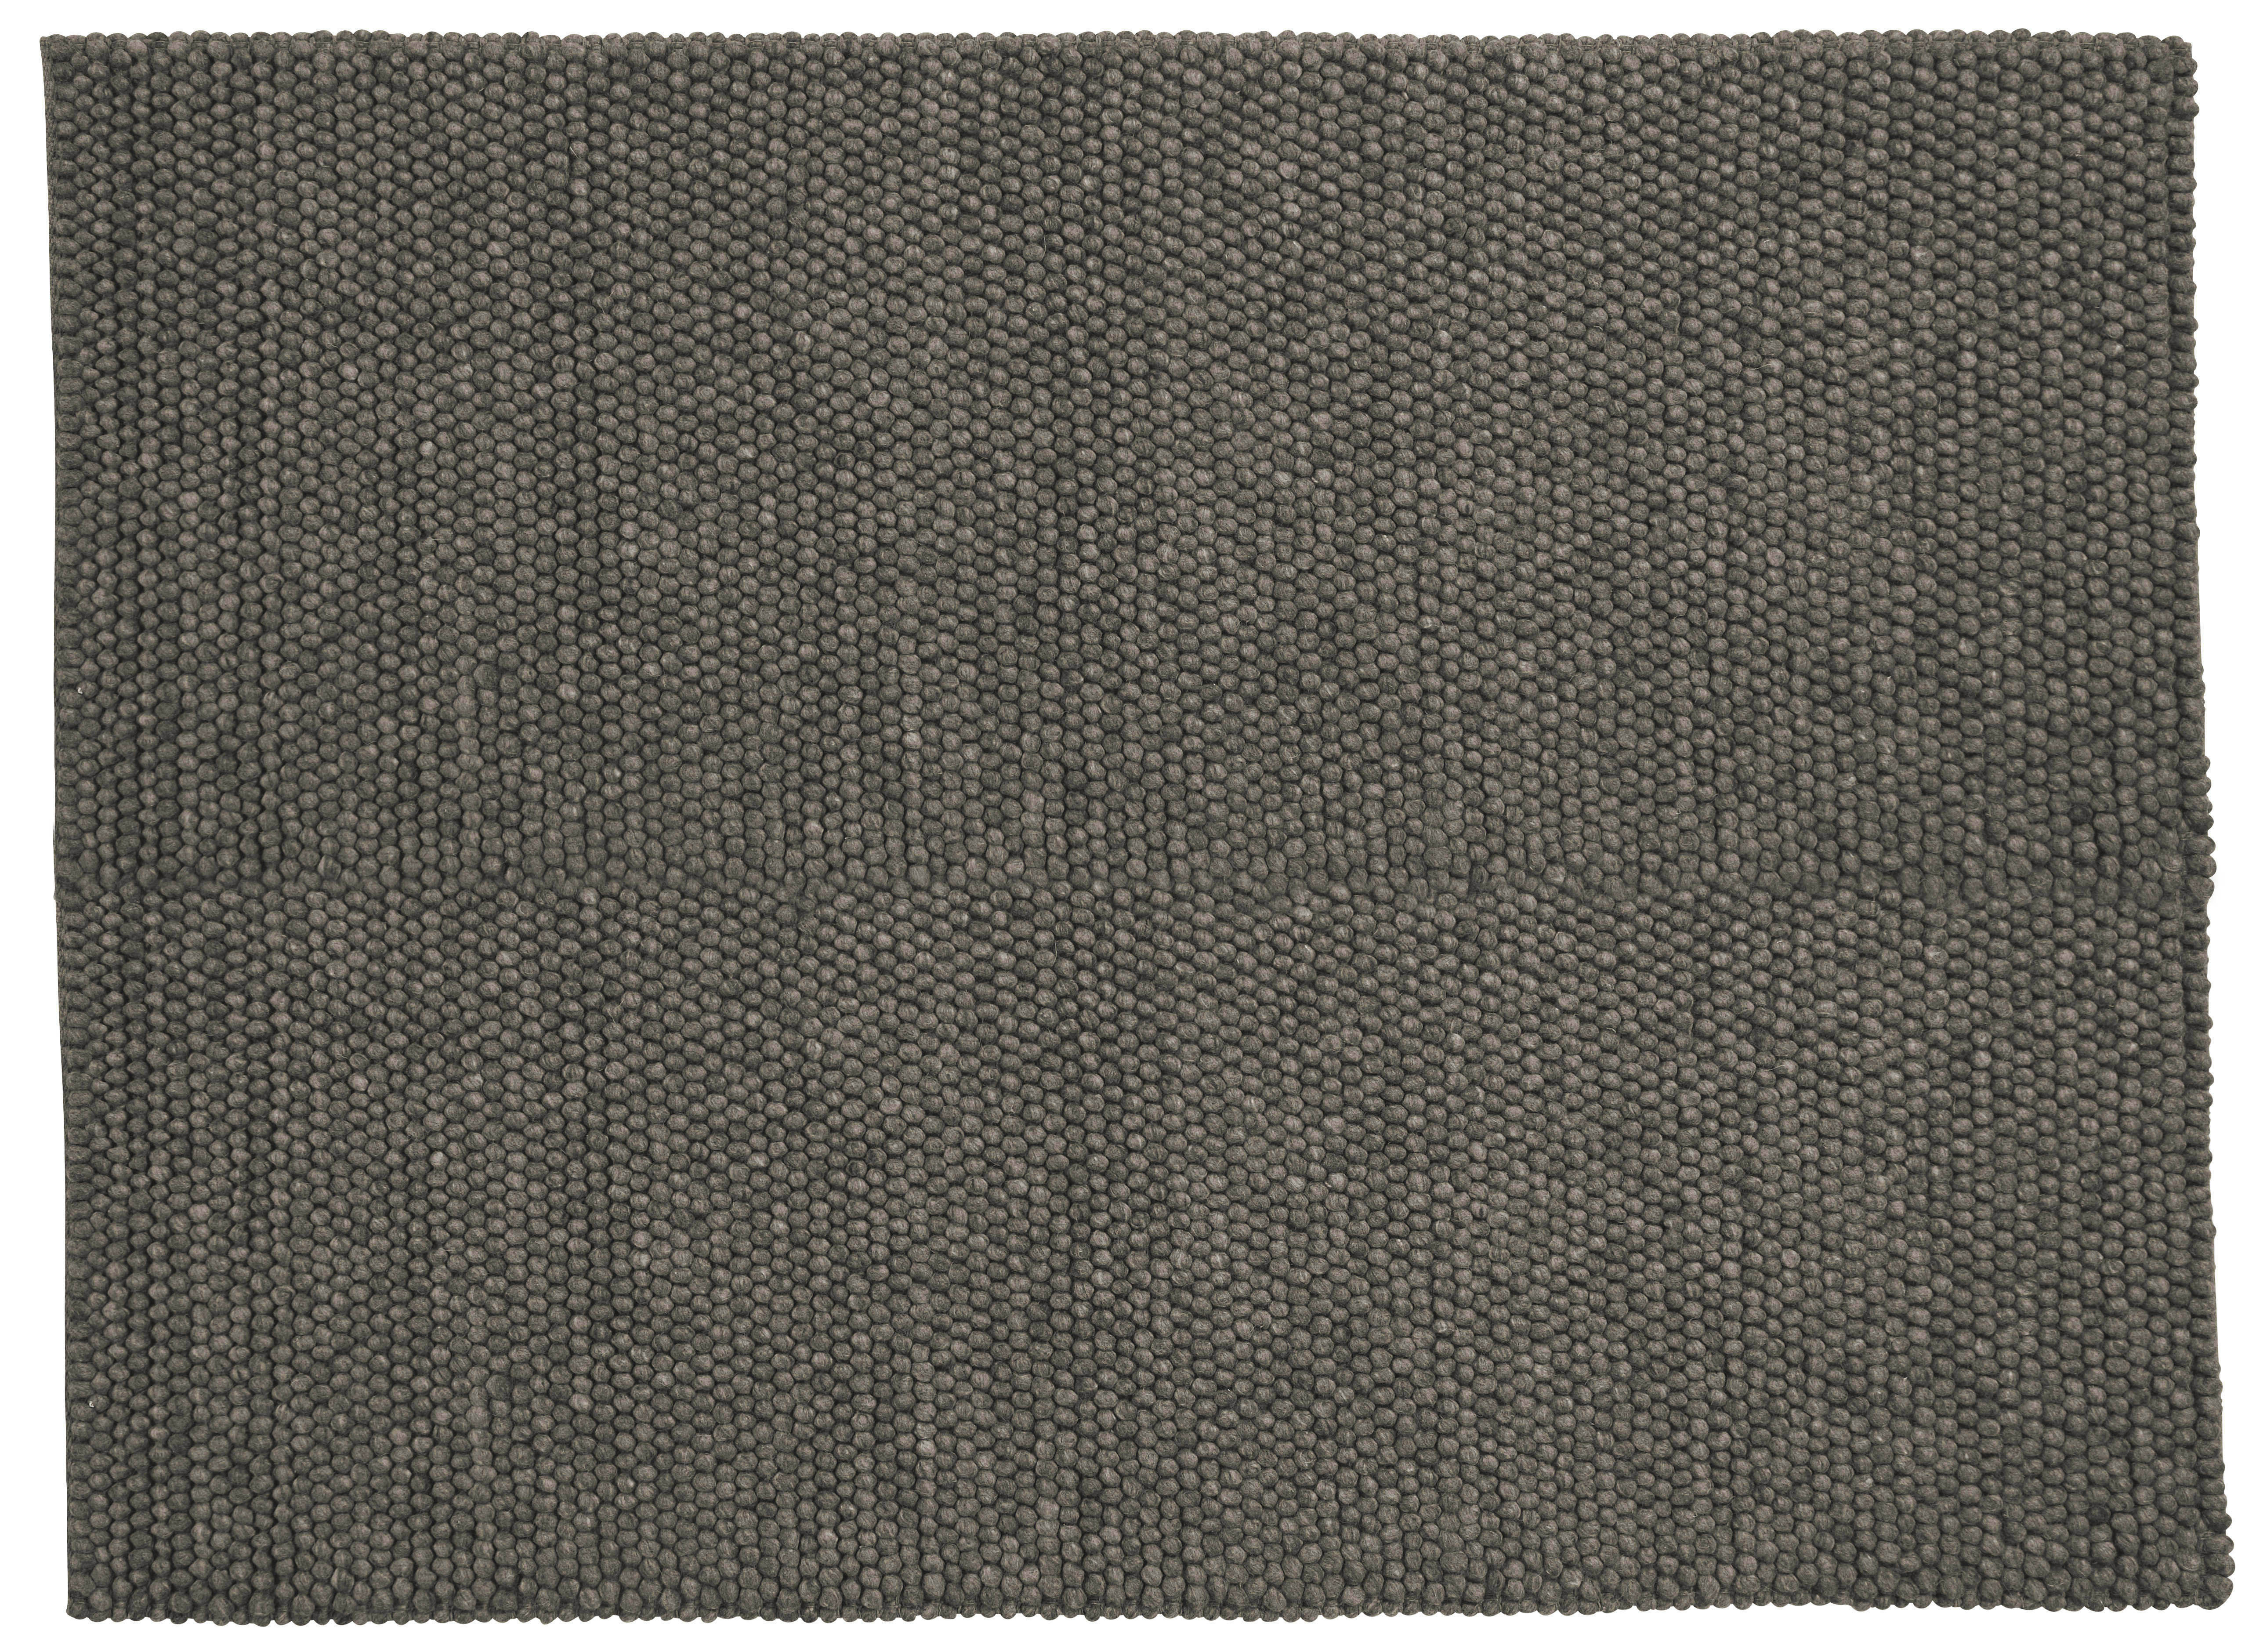 Dekoration - Teppiche - Peas Teppich / 140 x 200 cm - Hay - Dunkelgrau - Wolle